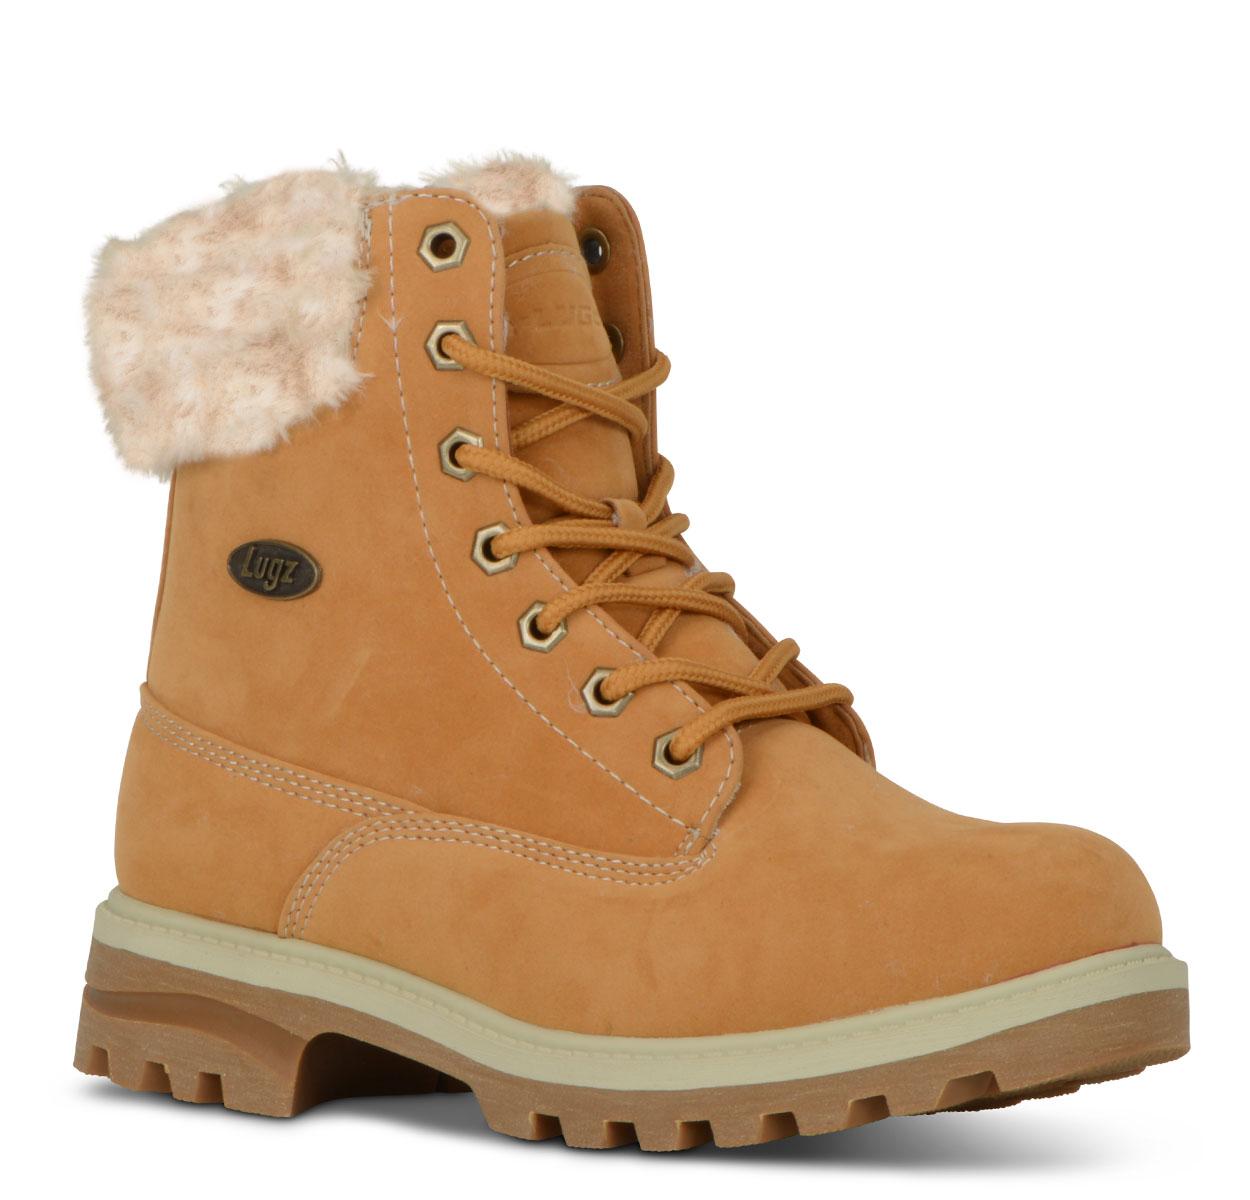 Women's Empire Hi Fur 6-Inch Boot (Choose Your Color: Golden Wheat/Cream/Gum, Choose Your Size: 10.0)